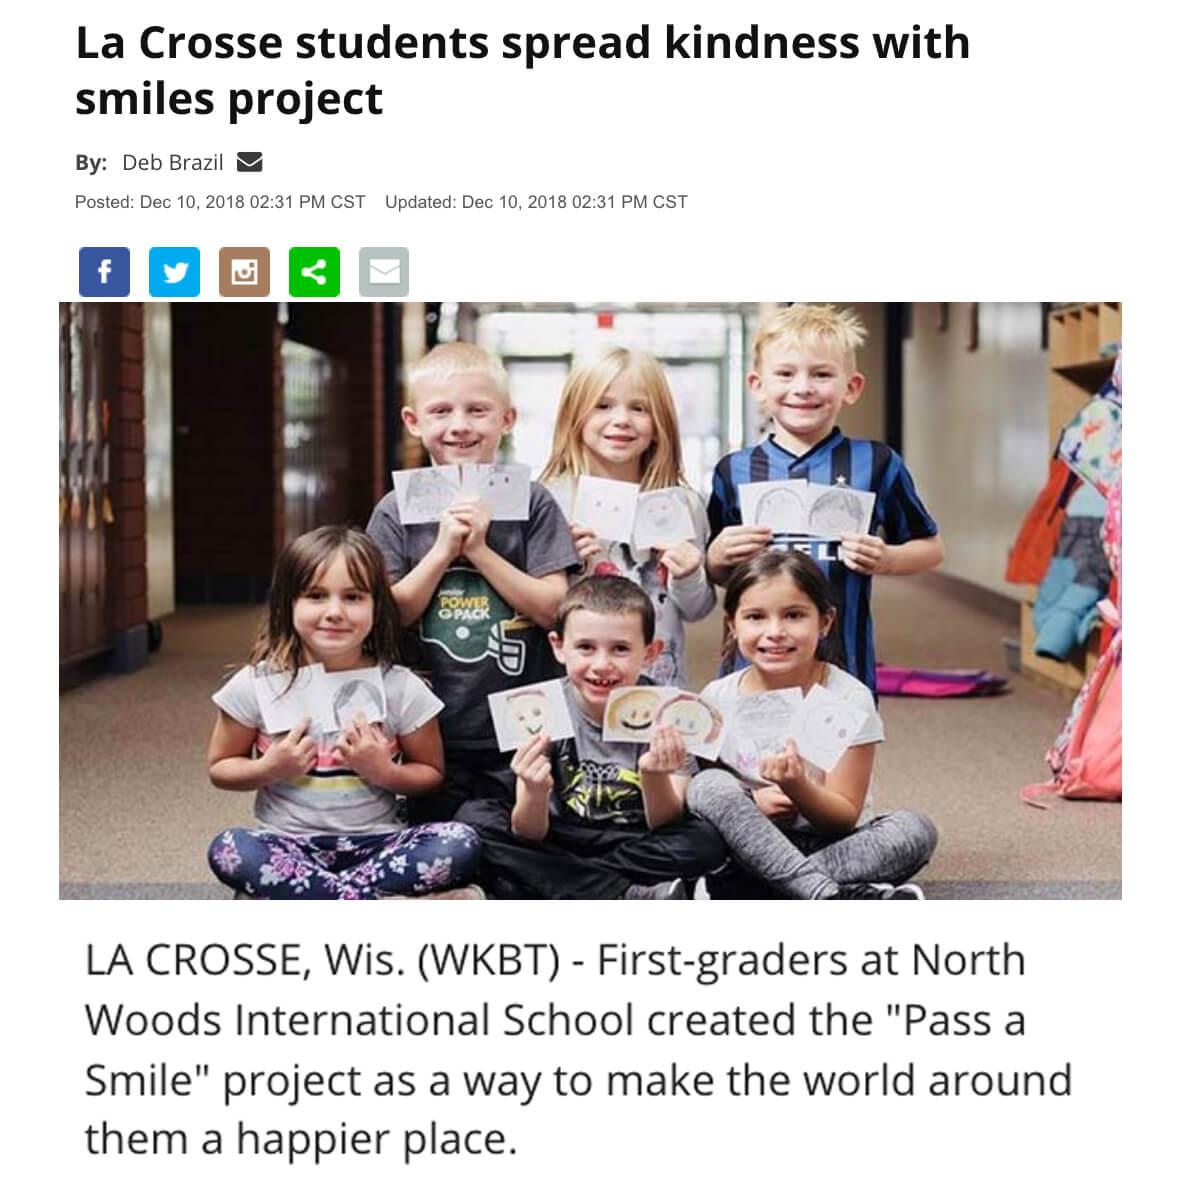 La Crosse Spread Smiles Project